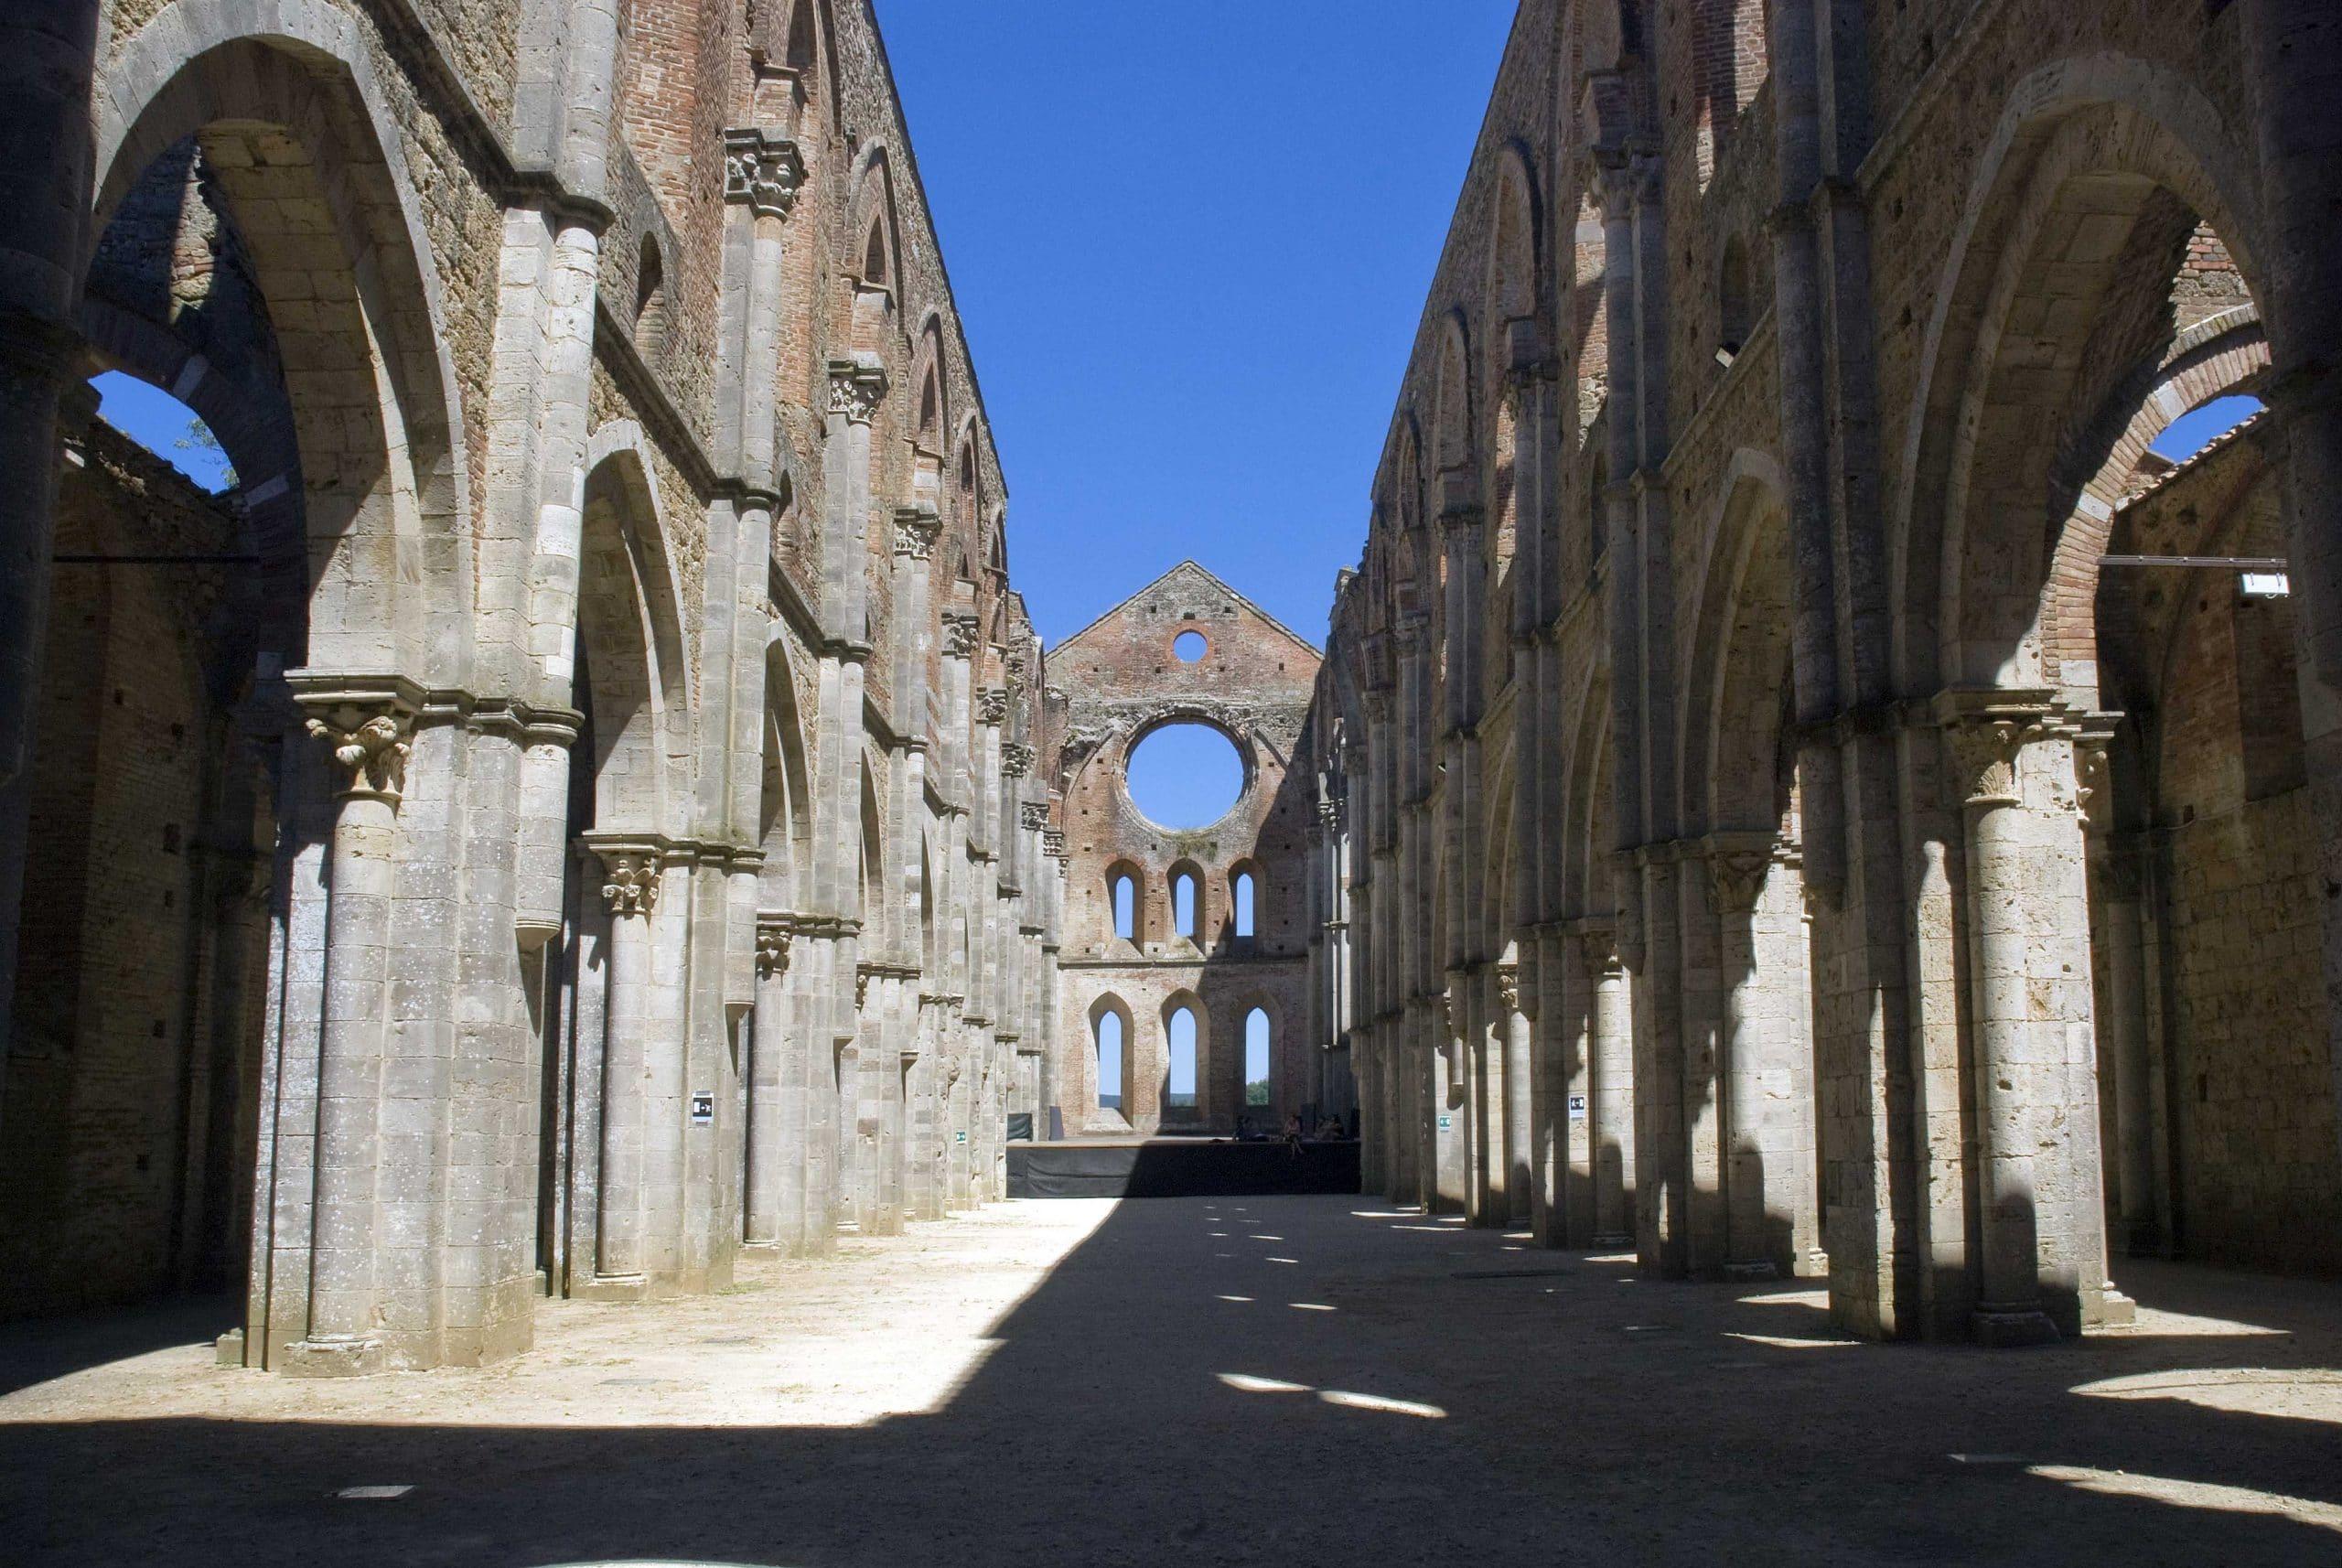 Die Umgebung von Siena